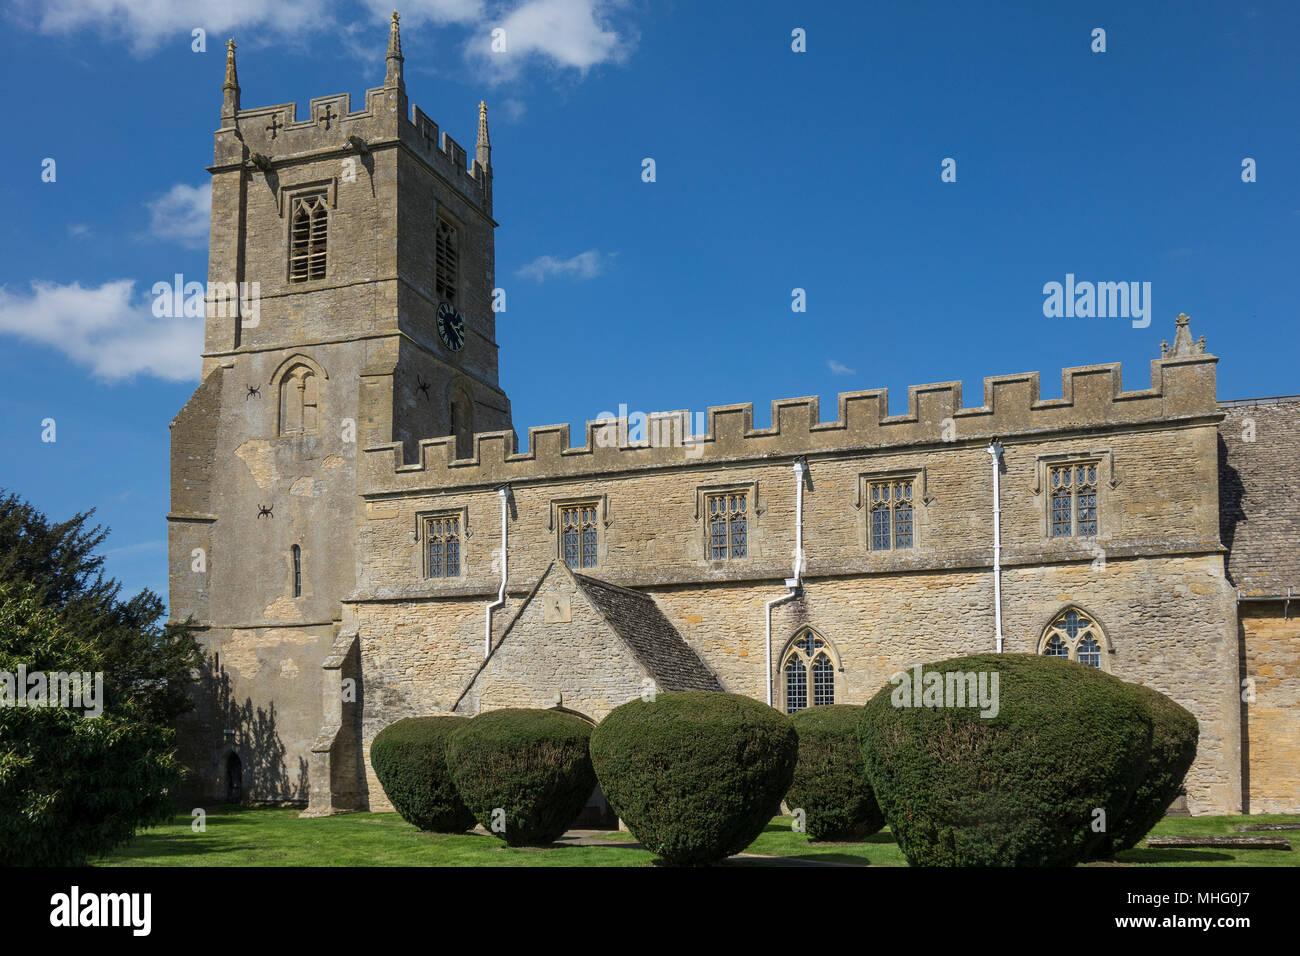 England, Warwickshire, Long Compton church - Stock Image